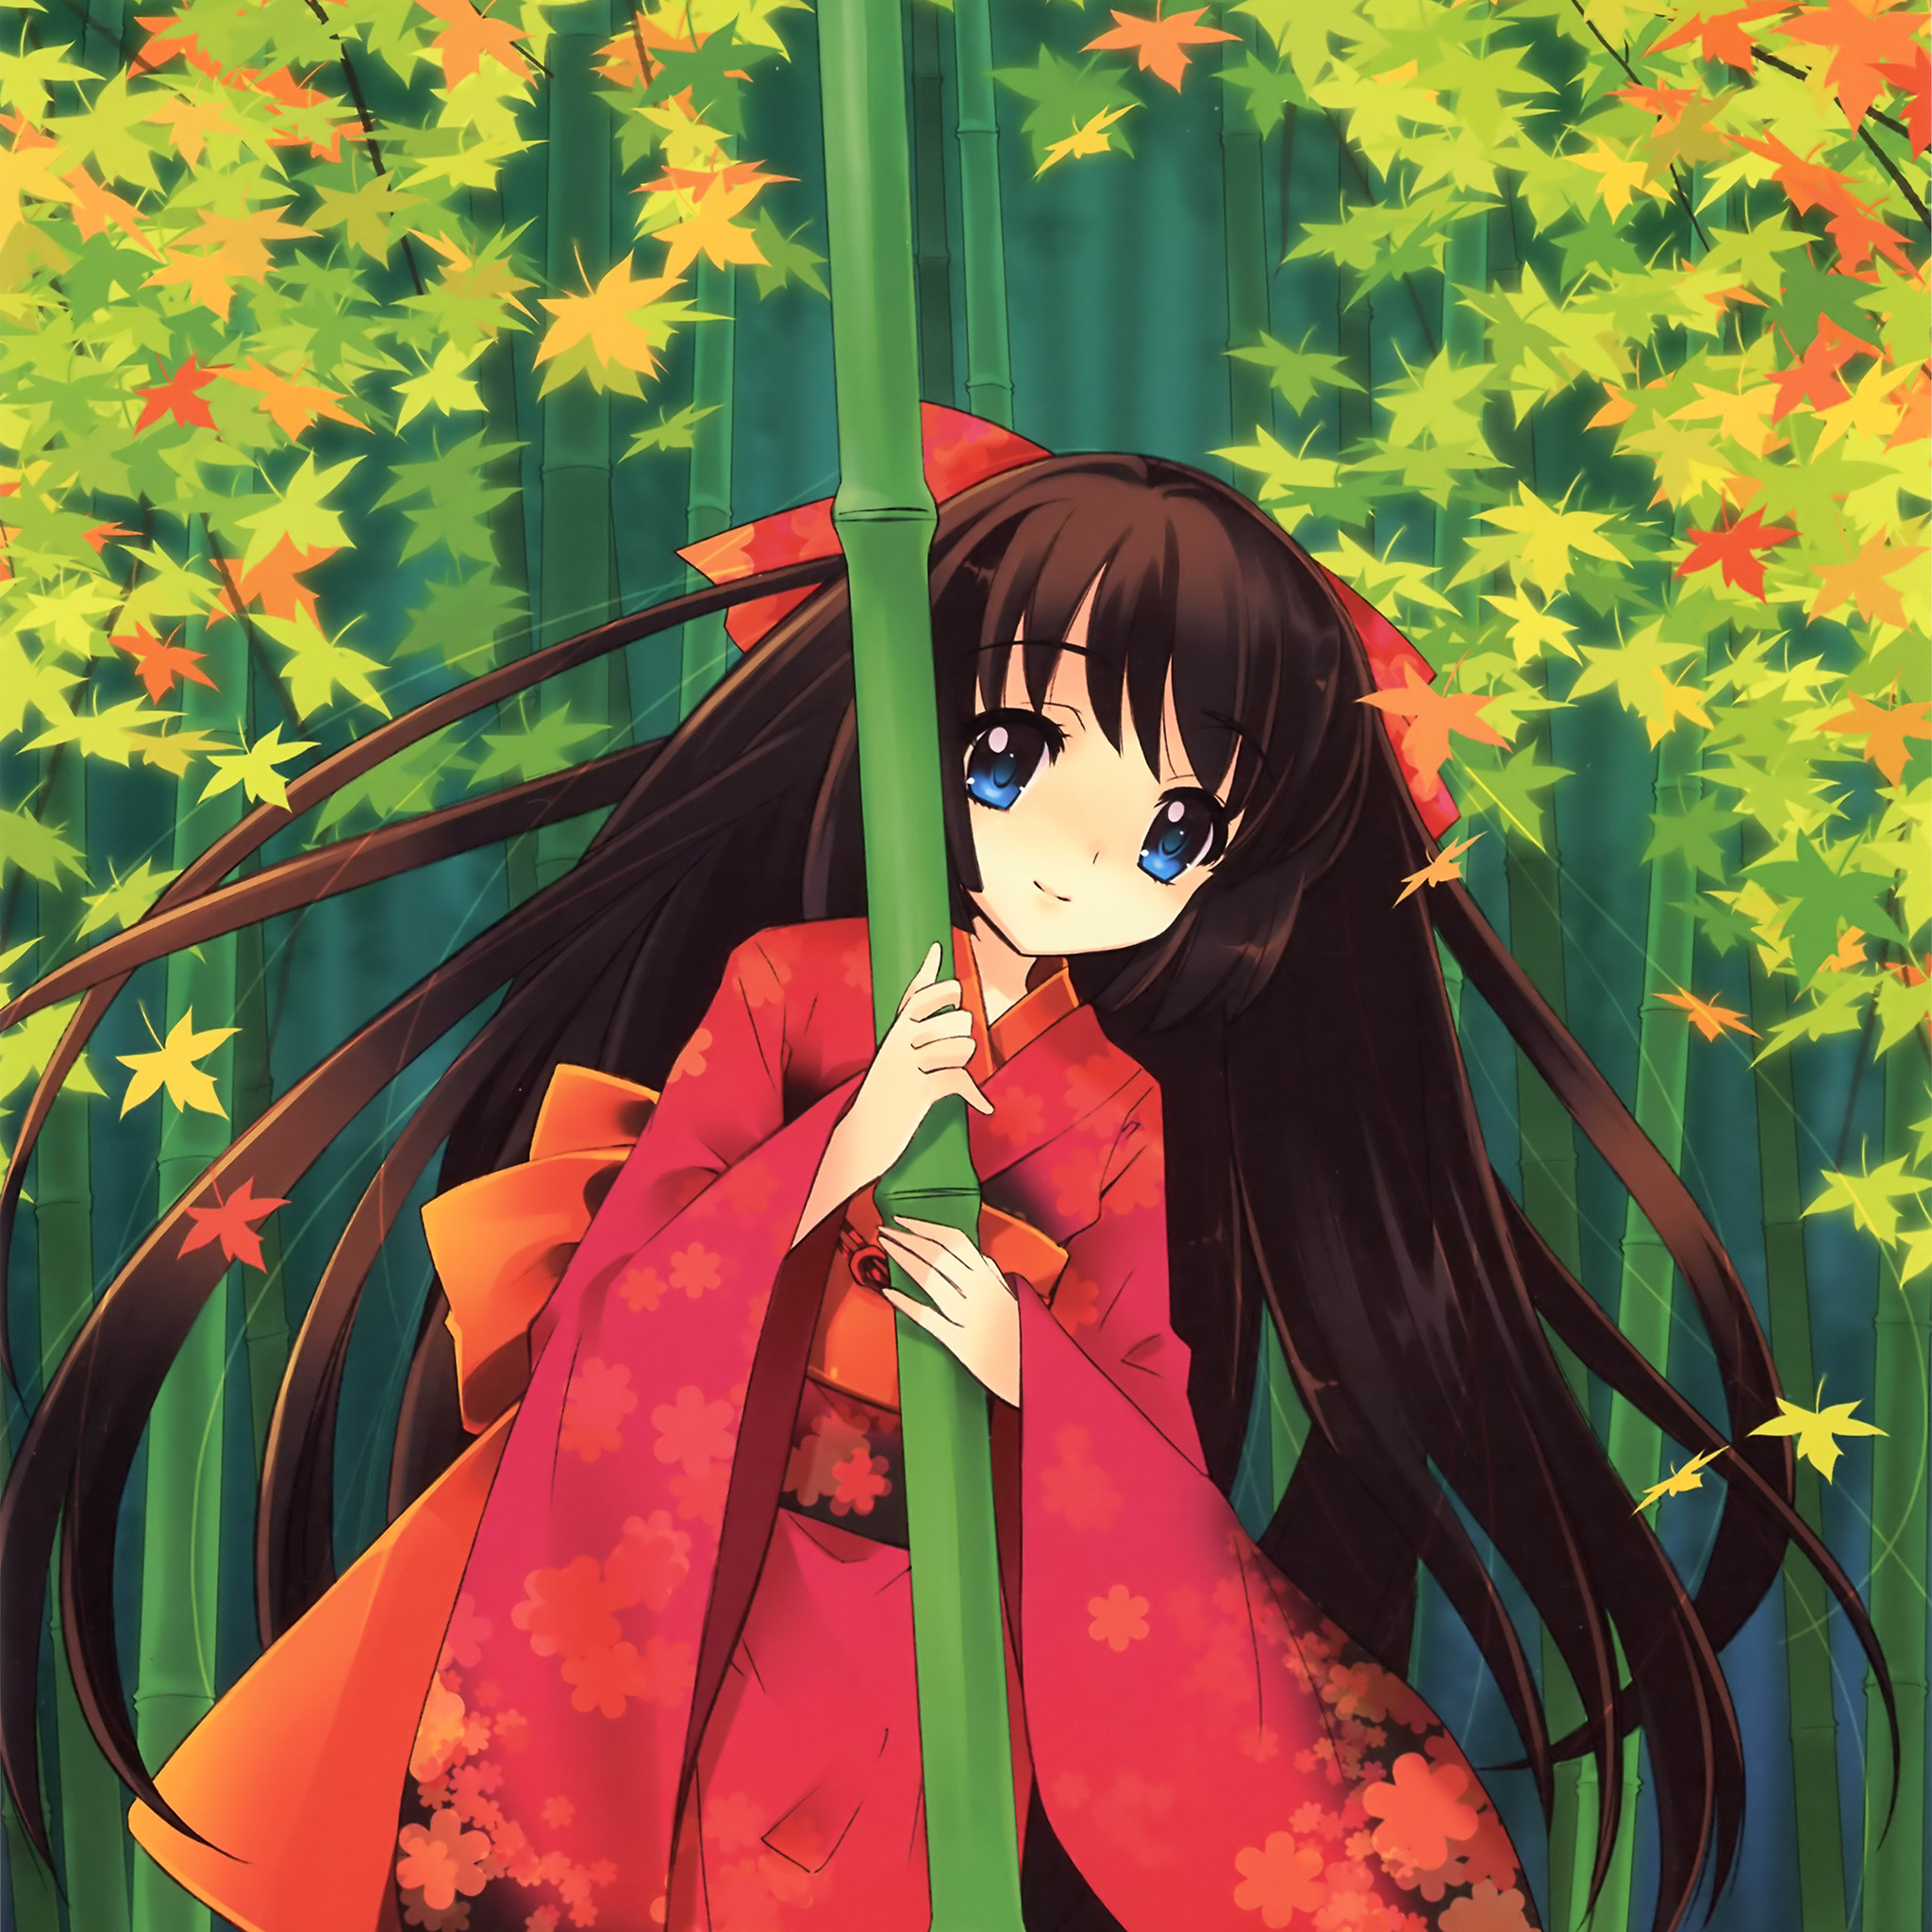 Cute Anime Wallpapers: Aq46-anime-girl-japan-art-cute-wallpaper